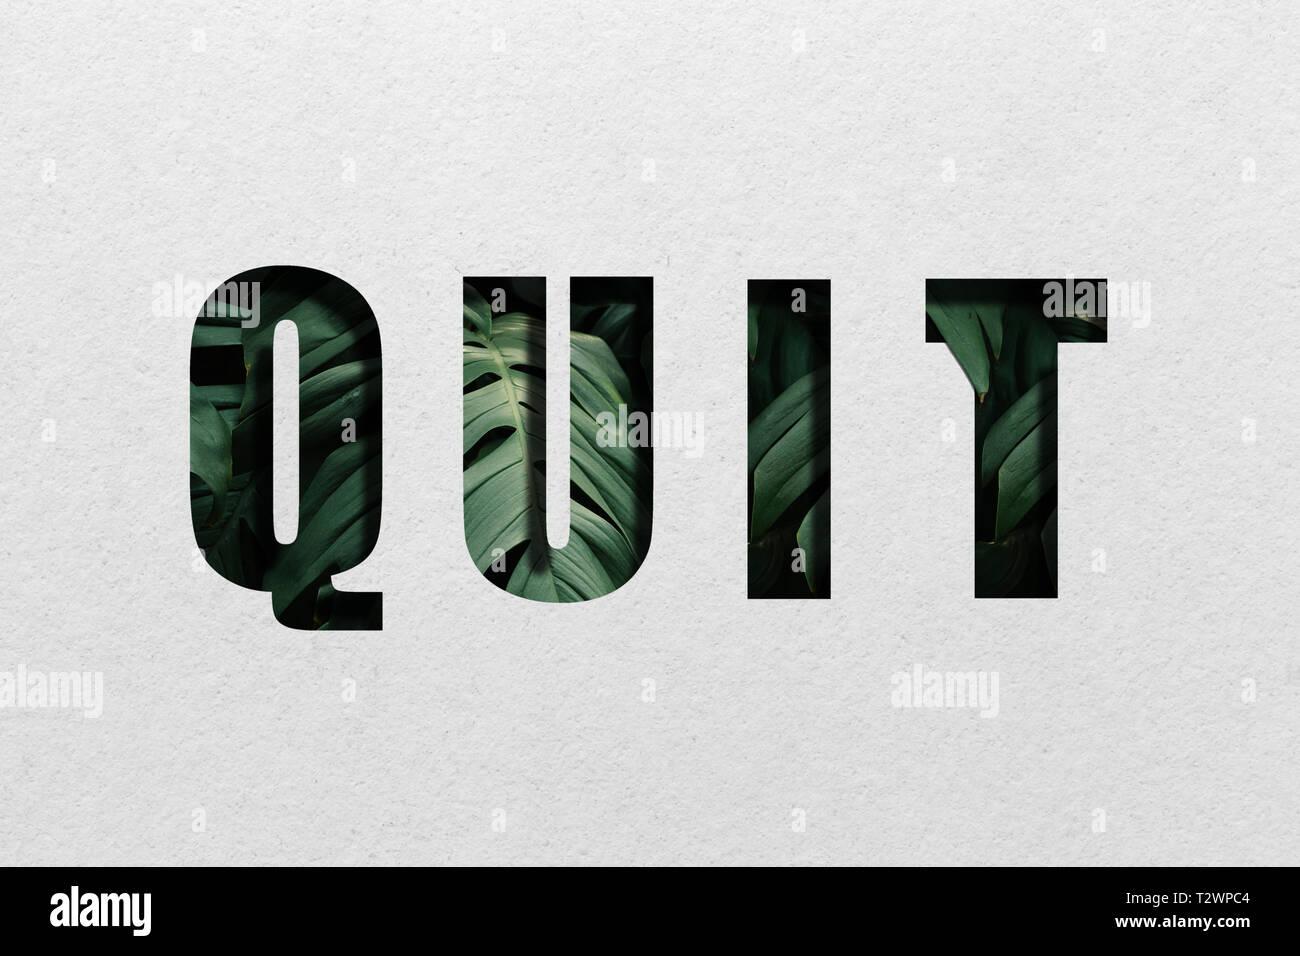 leaf letter word quit - Stock Image